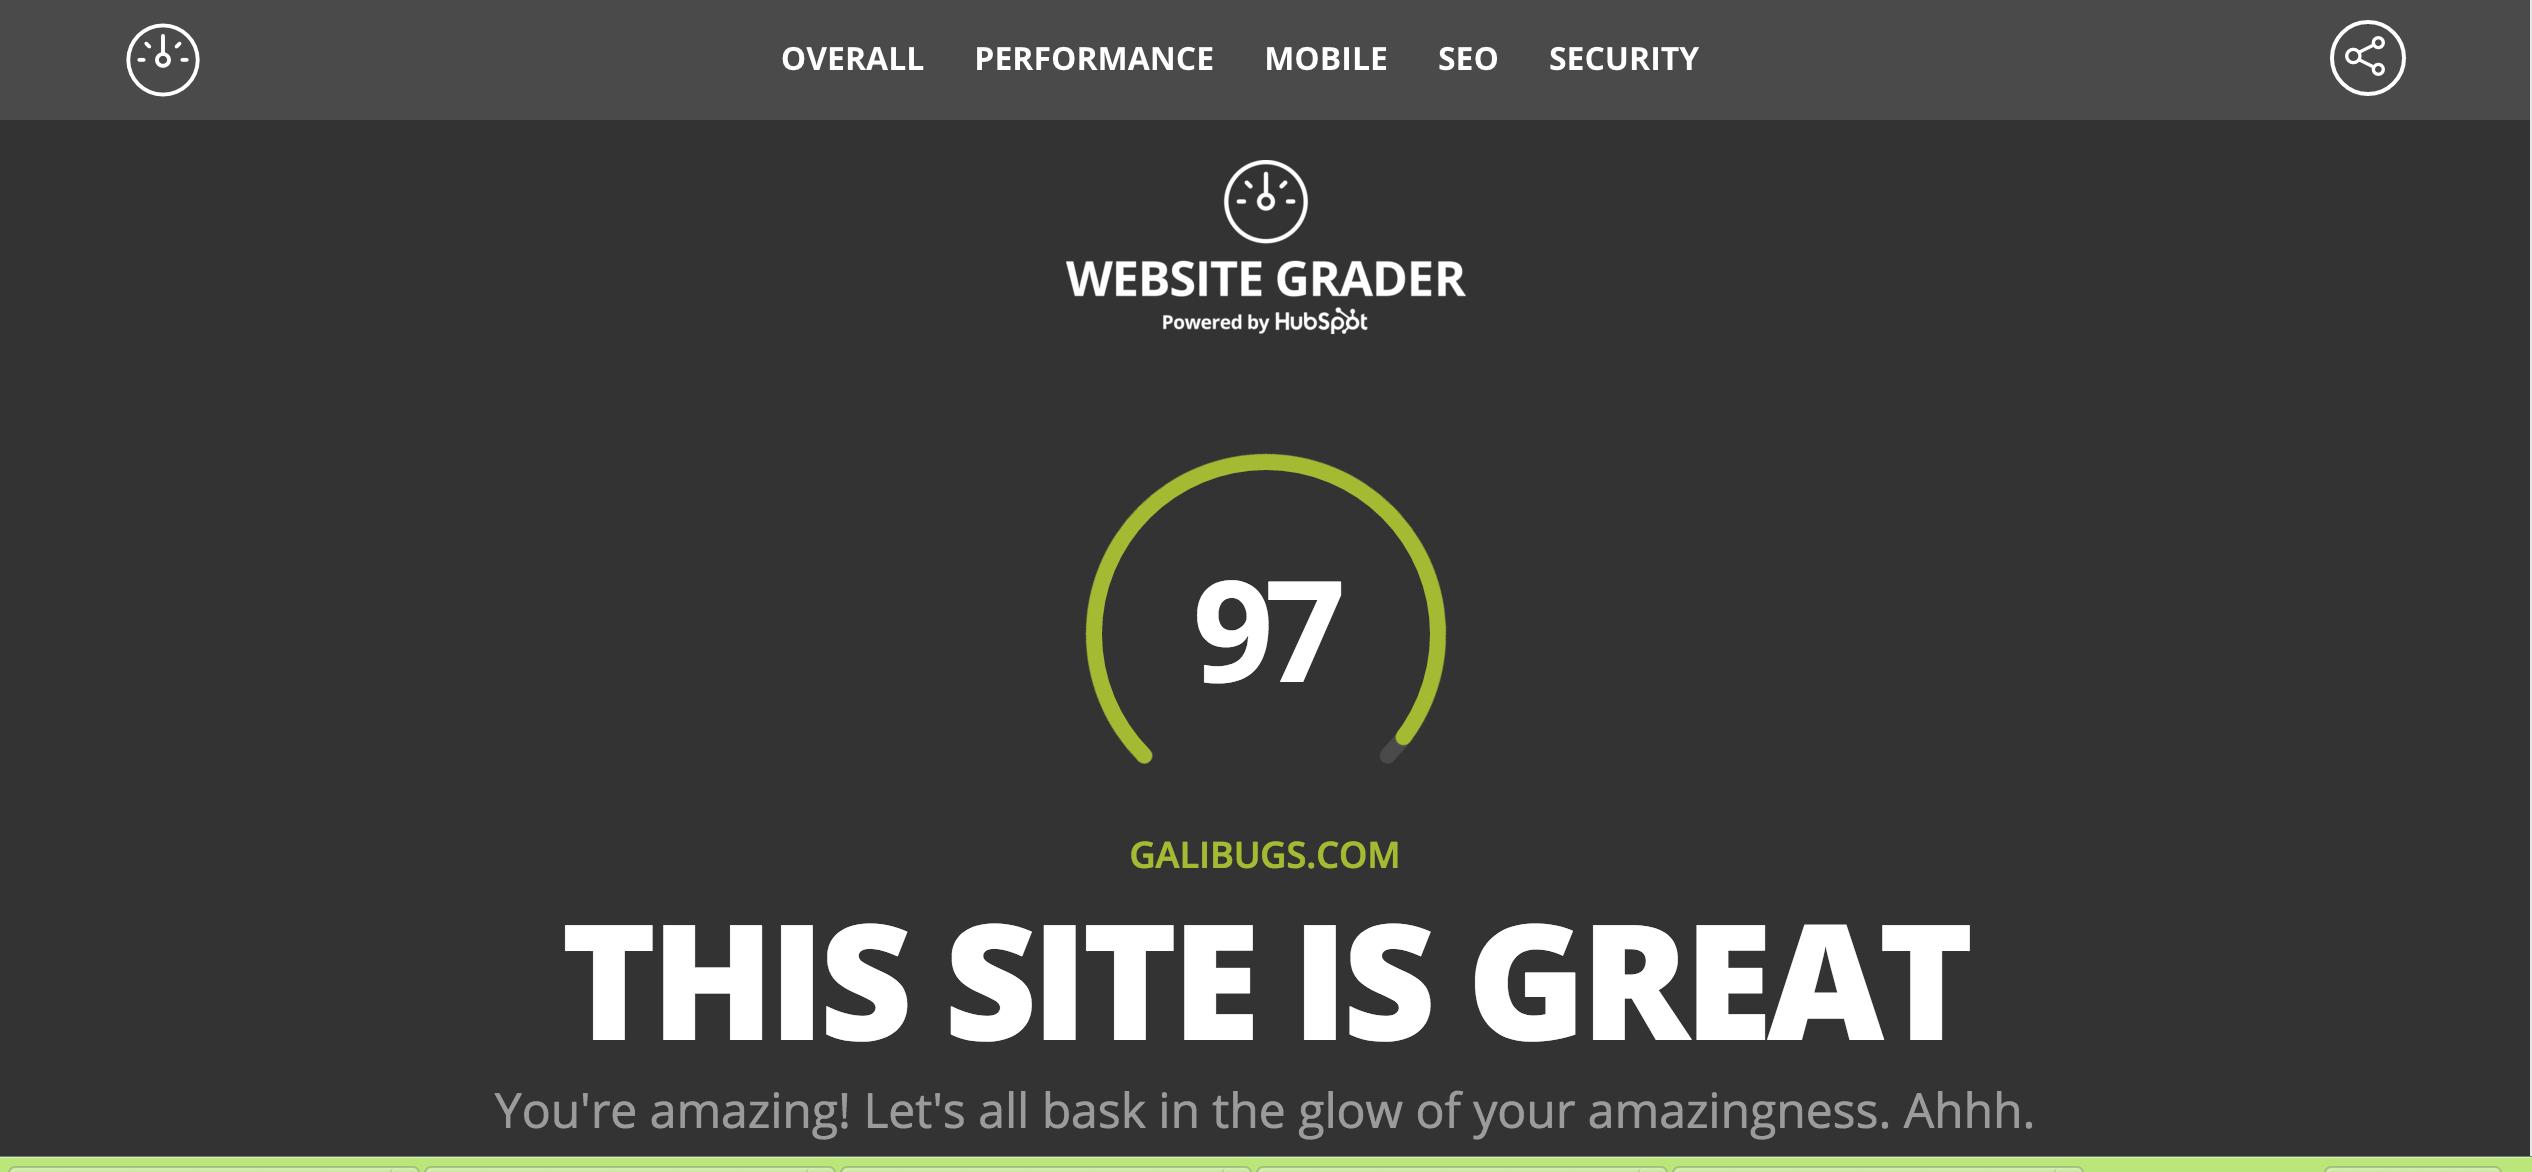 Website grading?